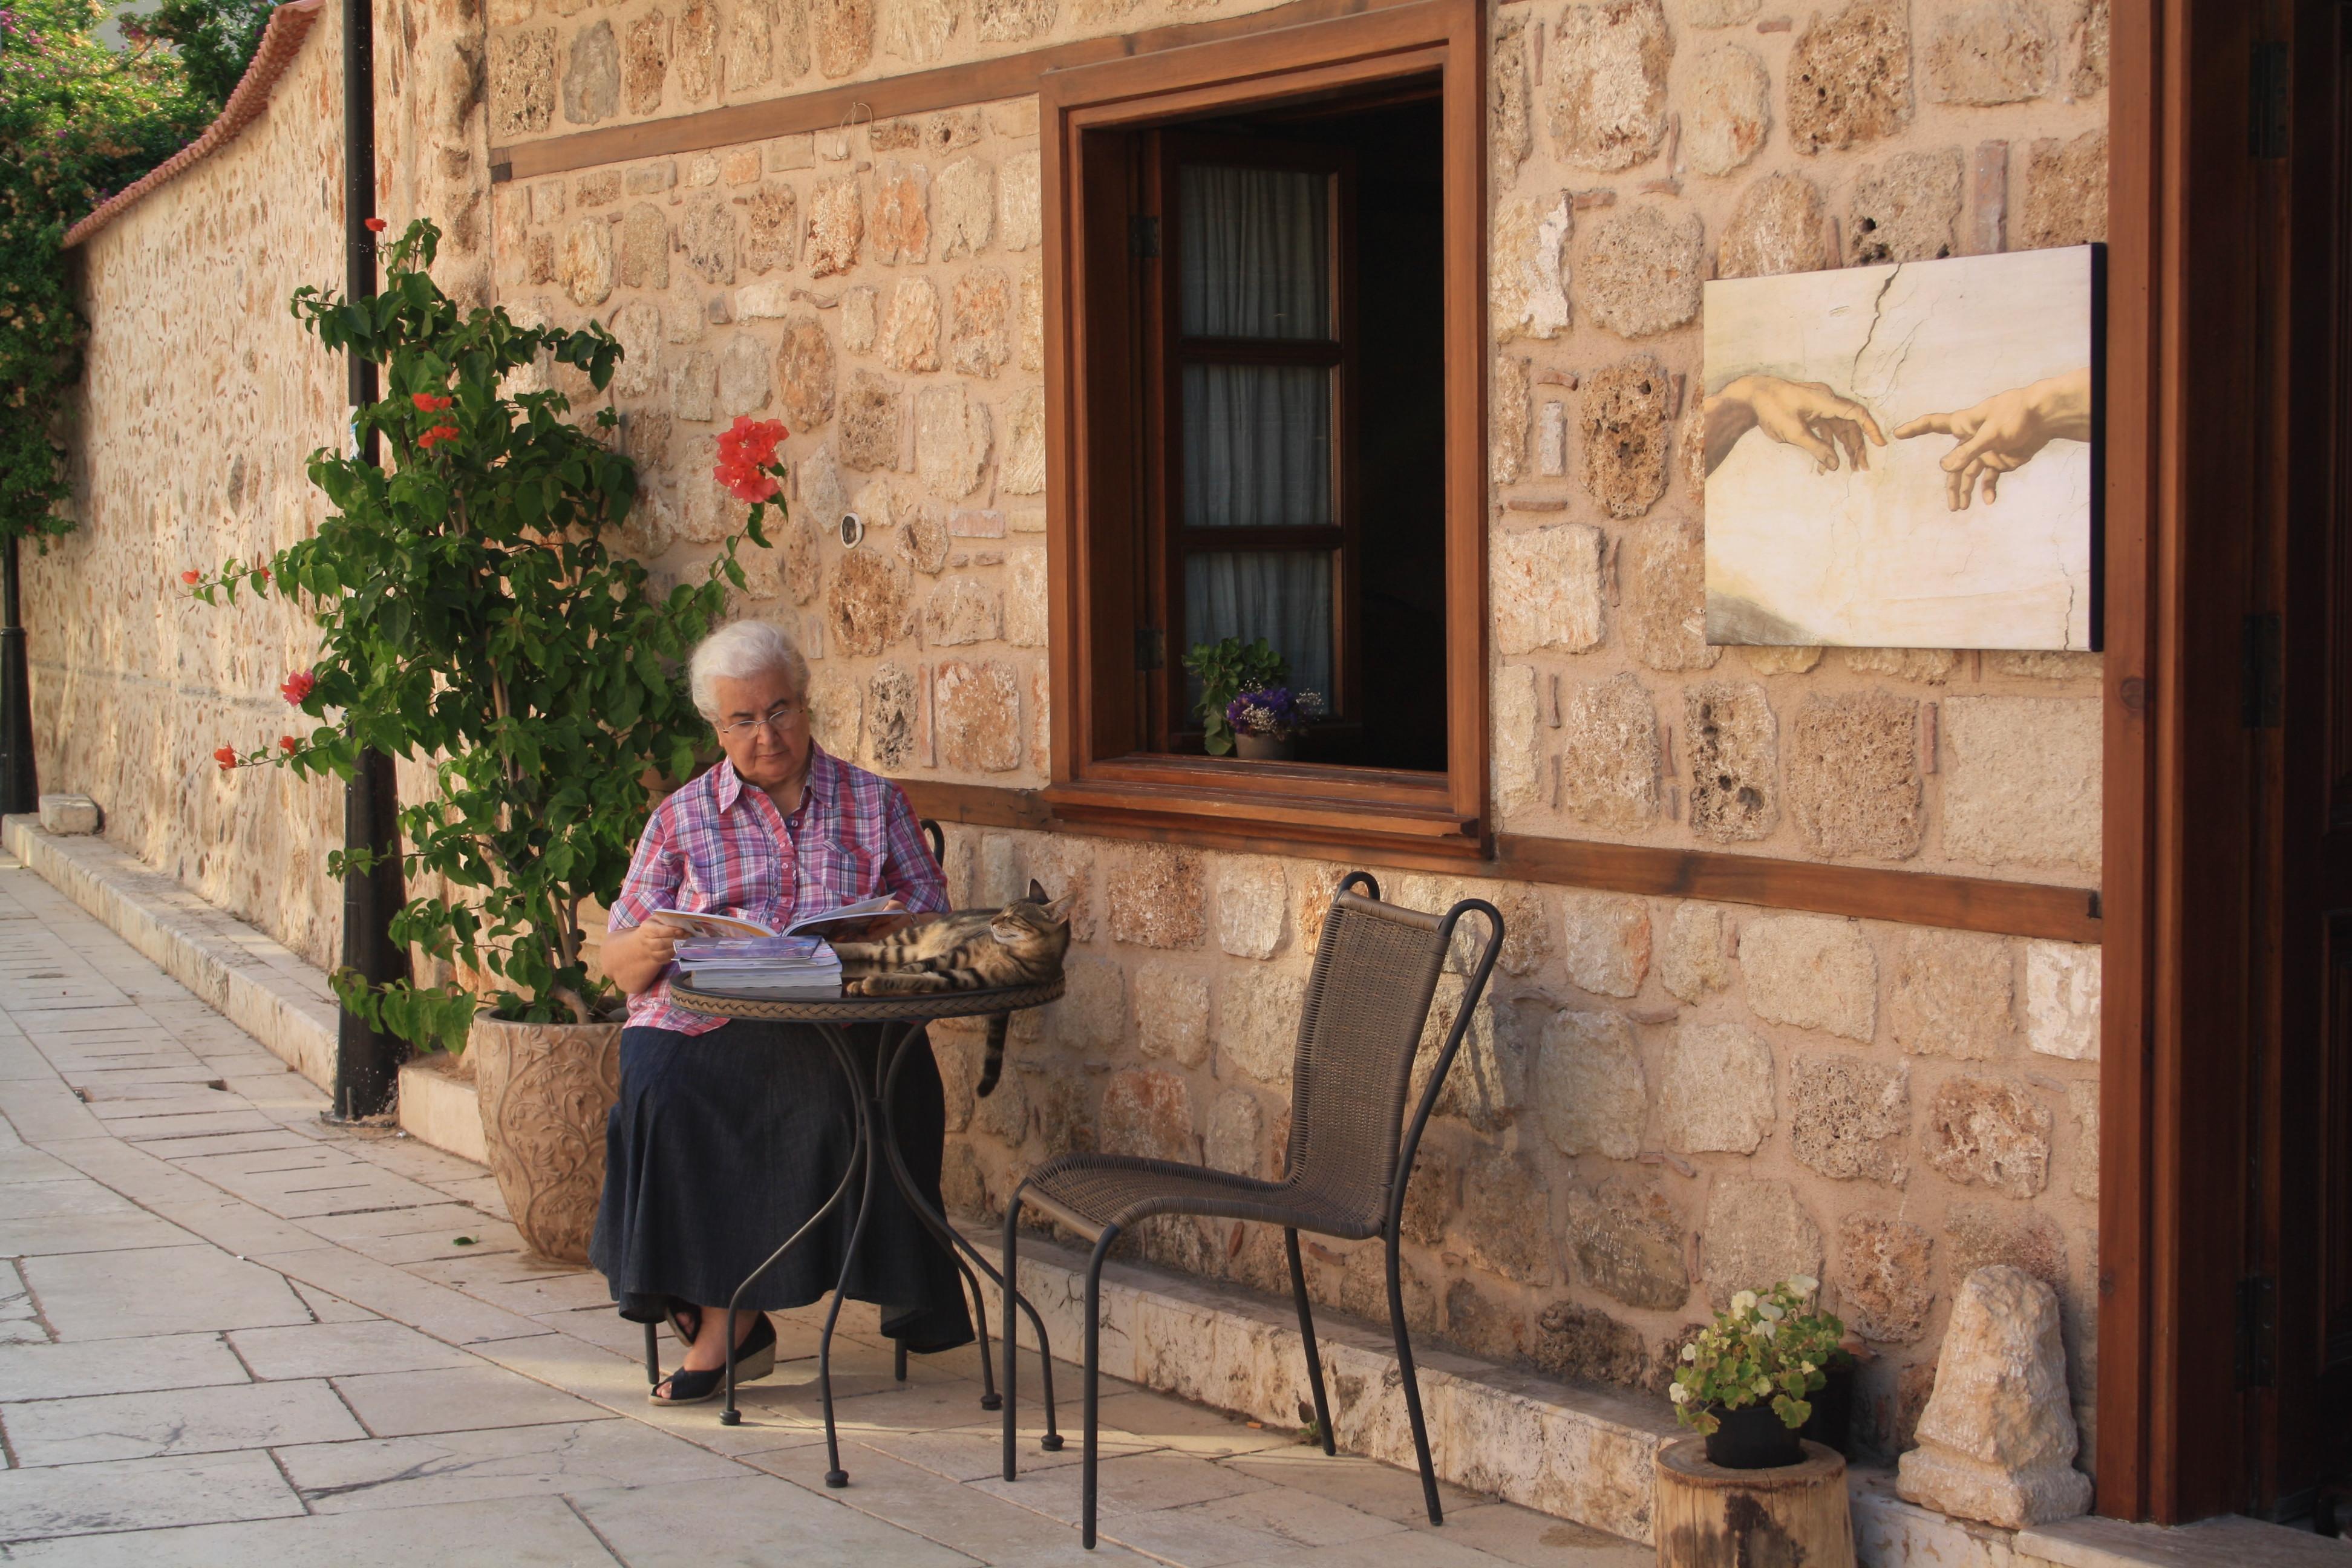 милая турецкая бабуля